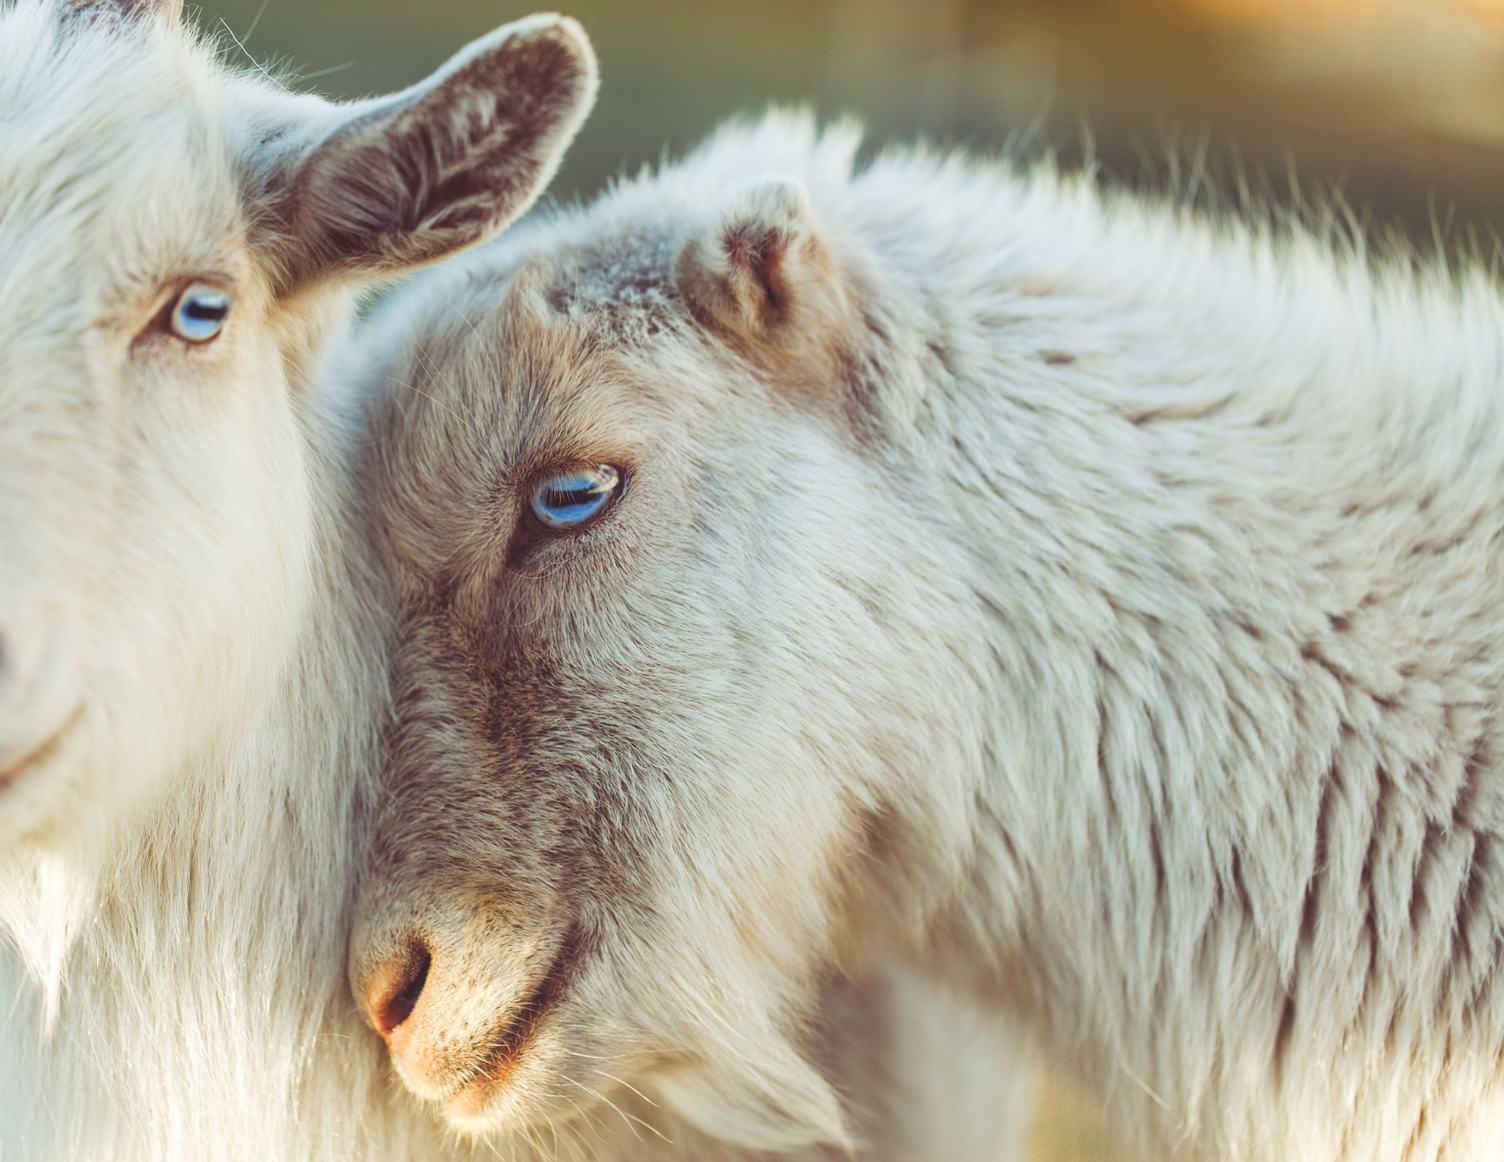 Closeup Portrait of a Head Goat